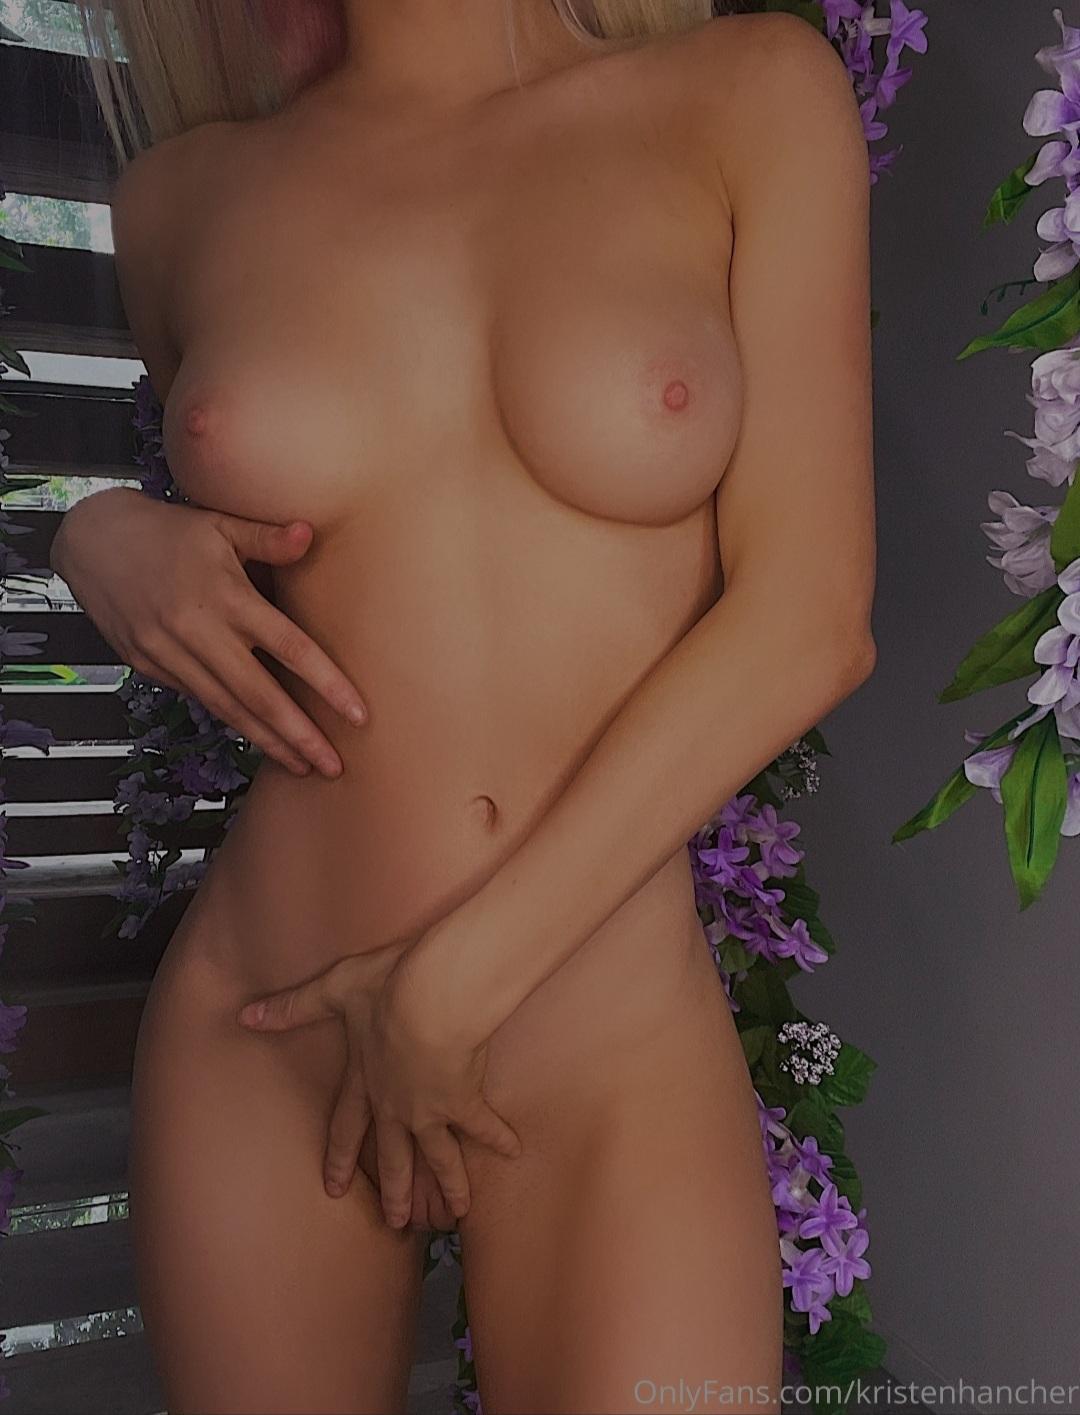 Kristen Hancher Nude Pussy Onlyfans Set Leaked Erpwbb